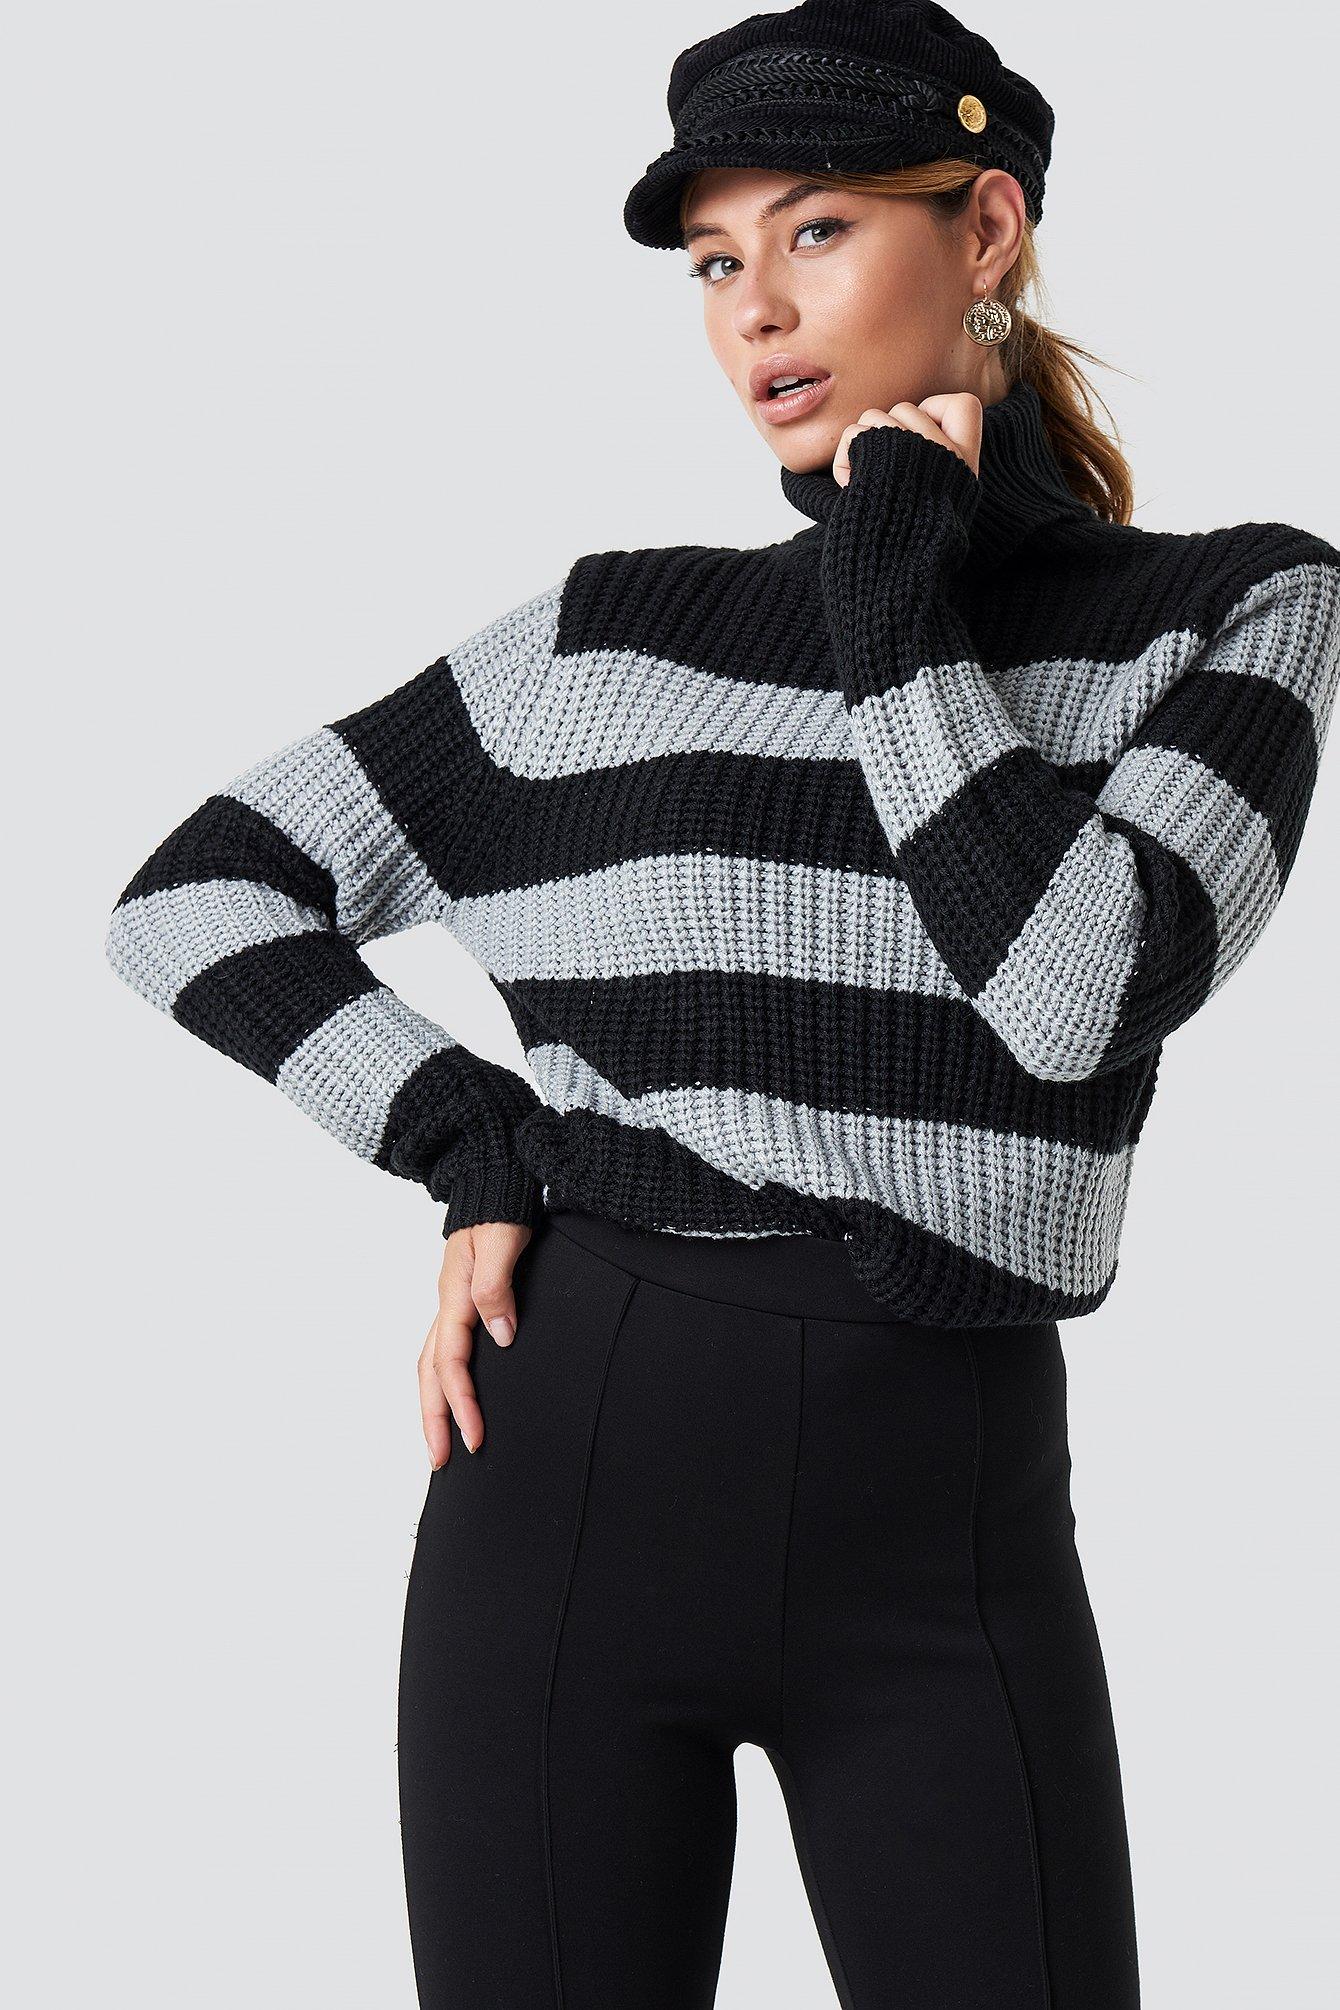 rut&circle -  Tinelle rollneck knit - Black,Grey,Multicolor